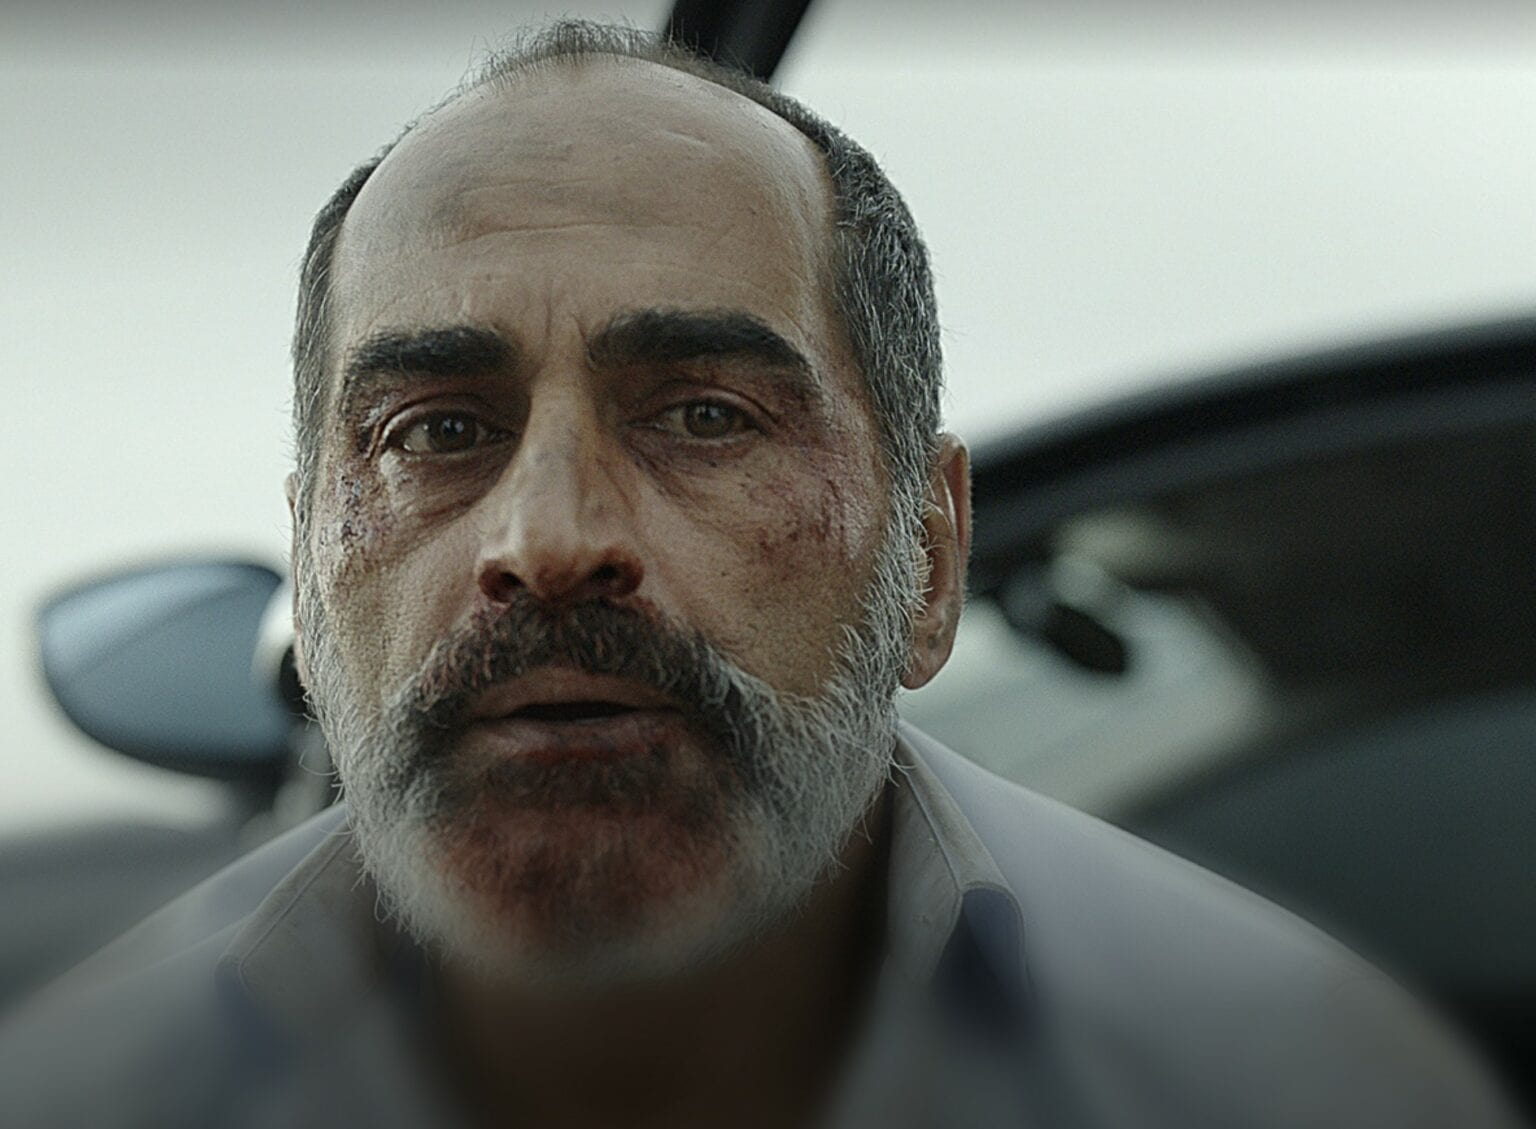 Tehran Episode 6